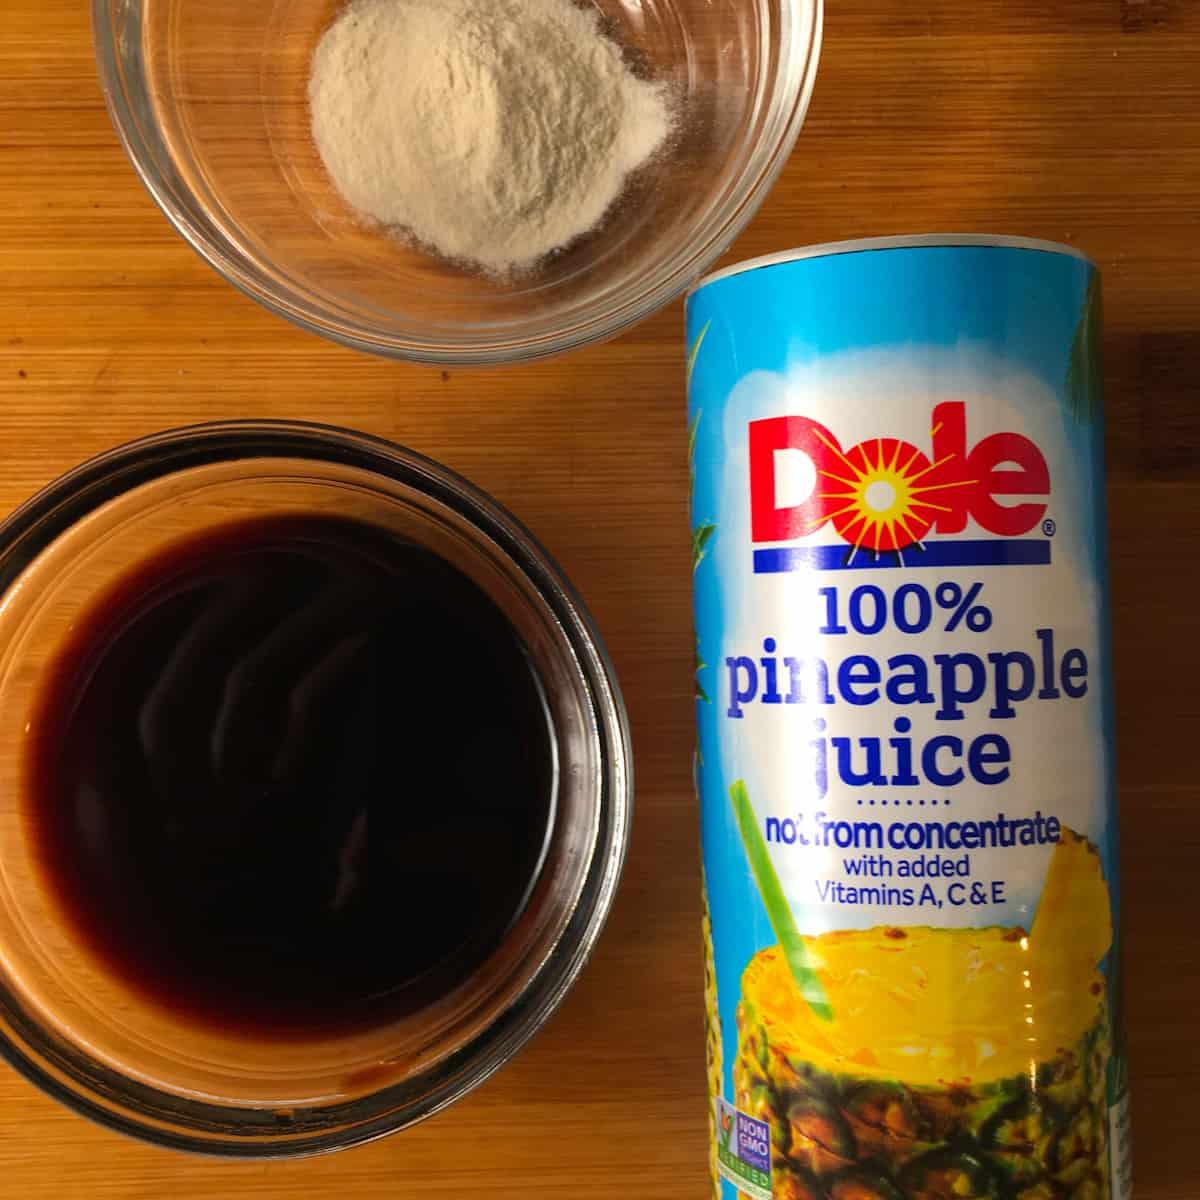 3 ingredient stir fry sauce ingredients